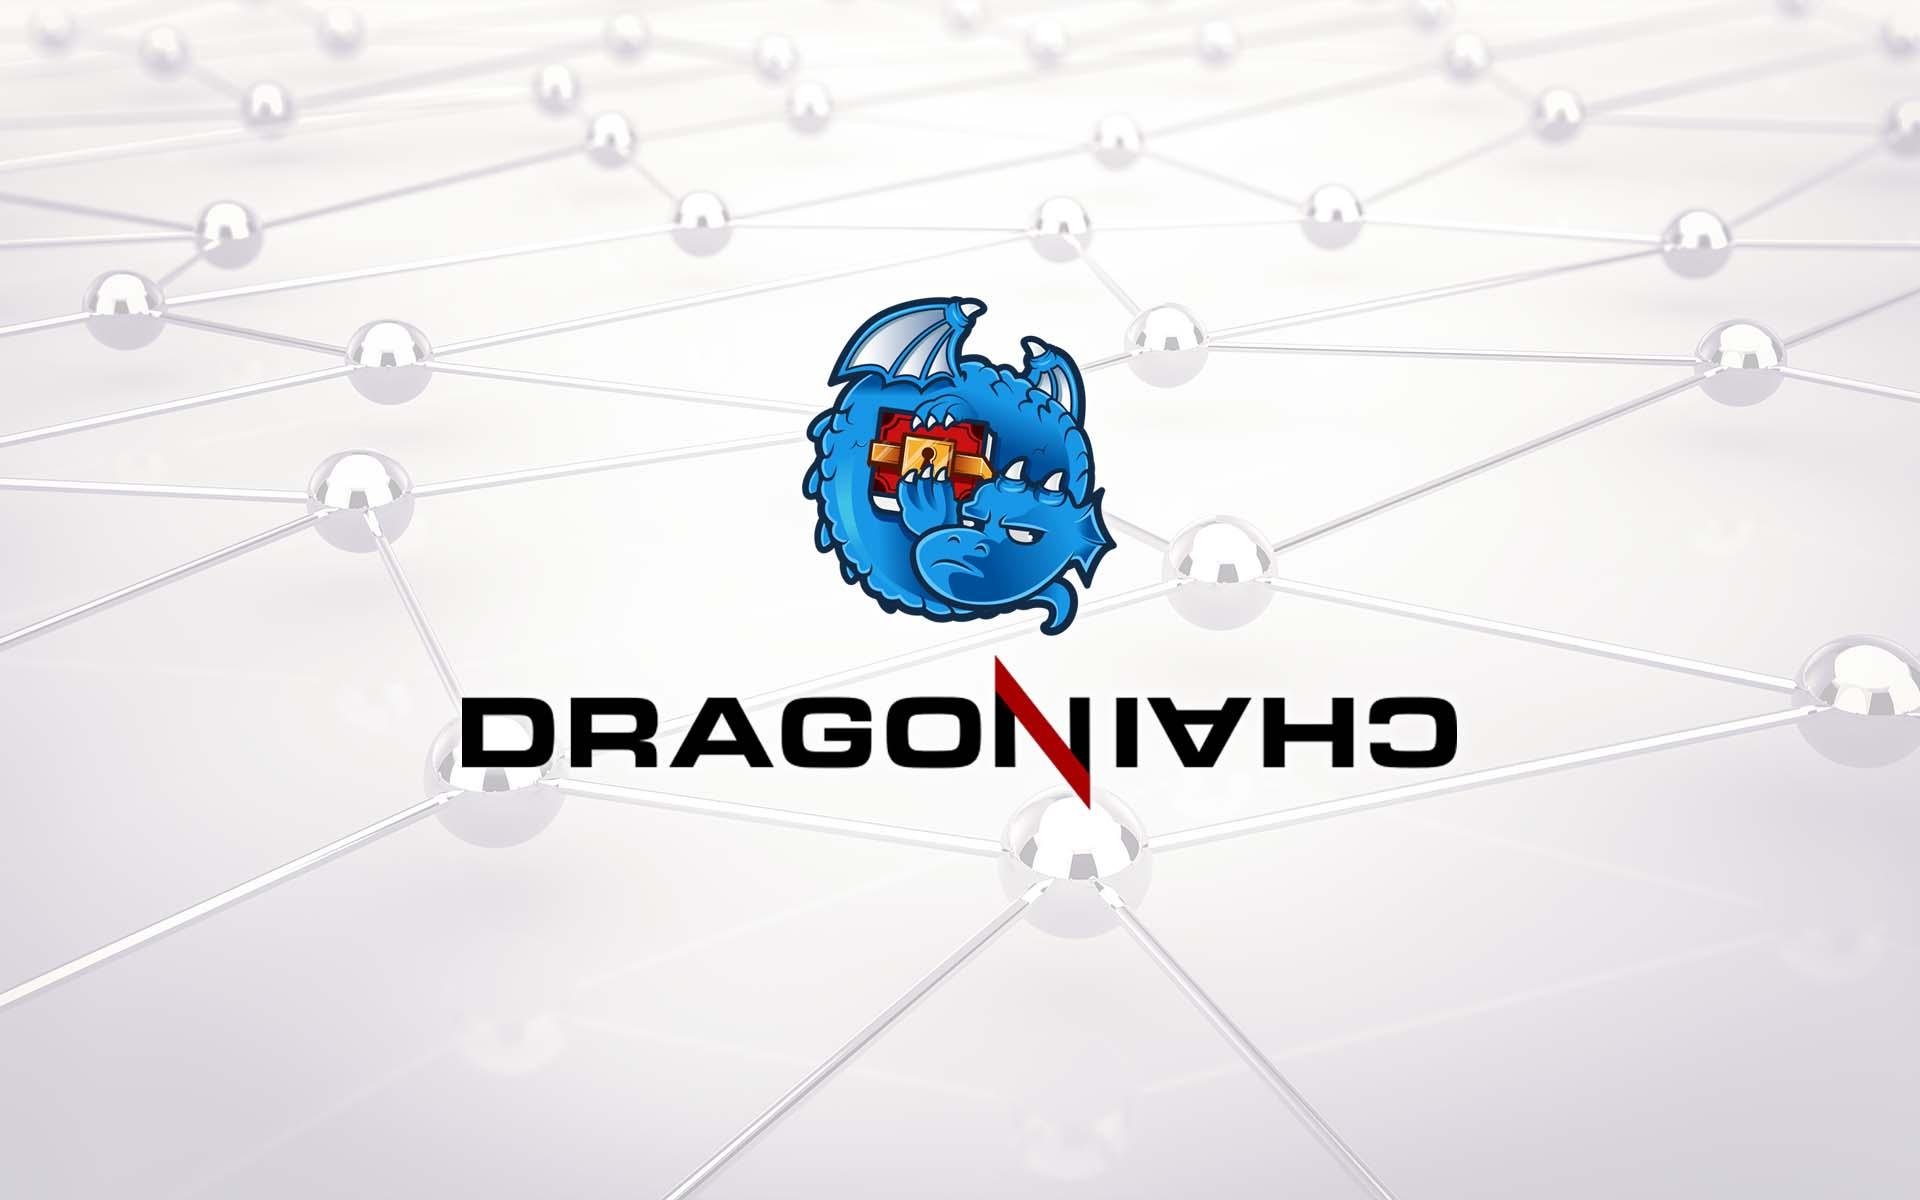 Dragonchain Introduces Business Facing Blockchain Platform